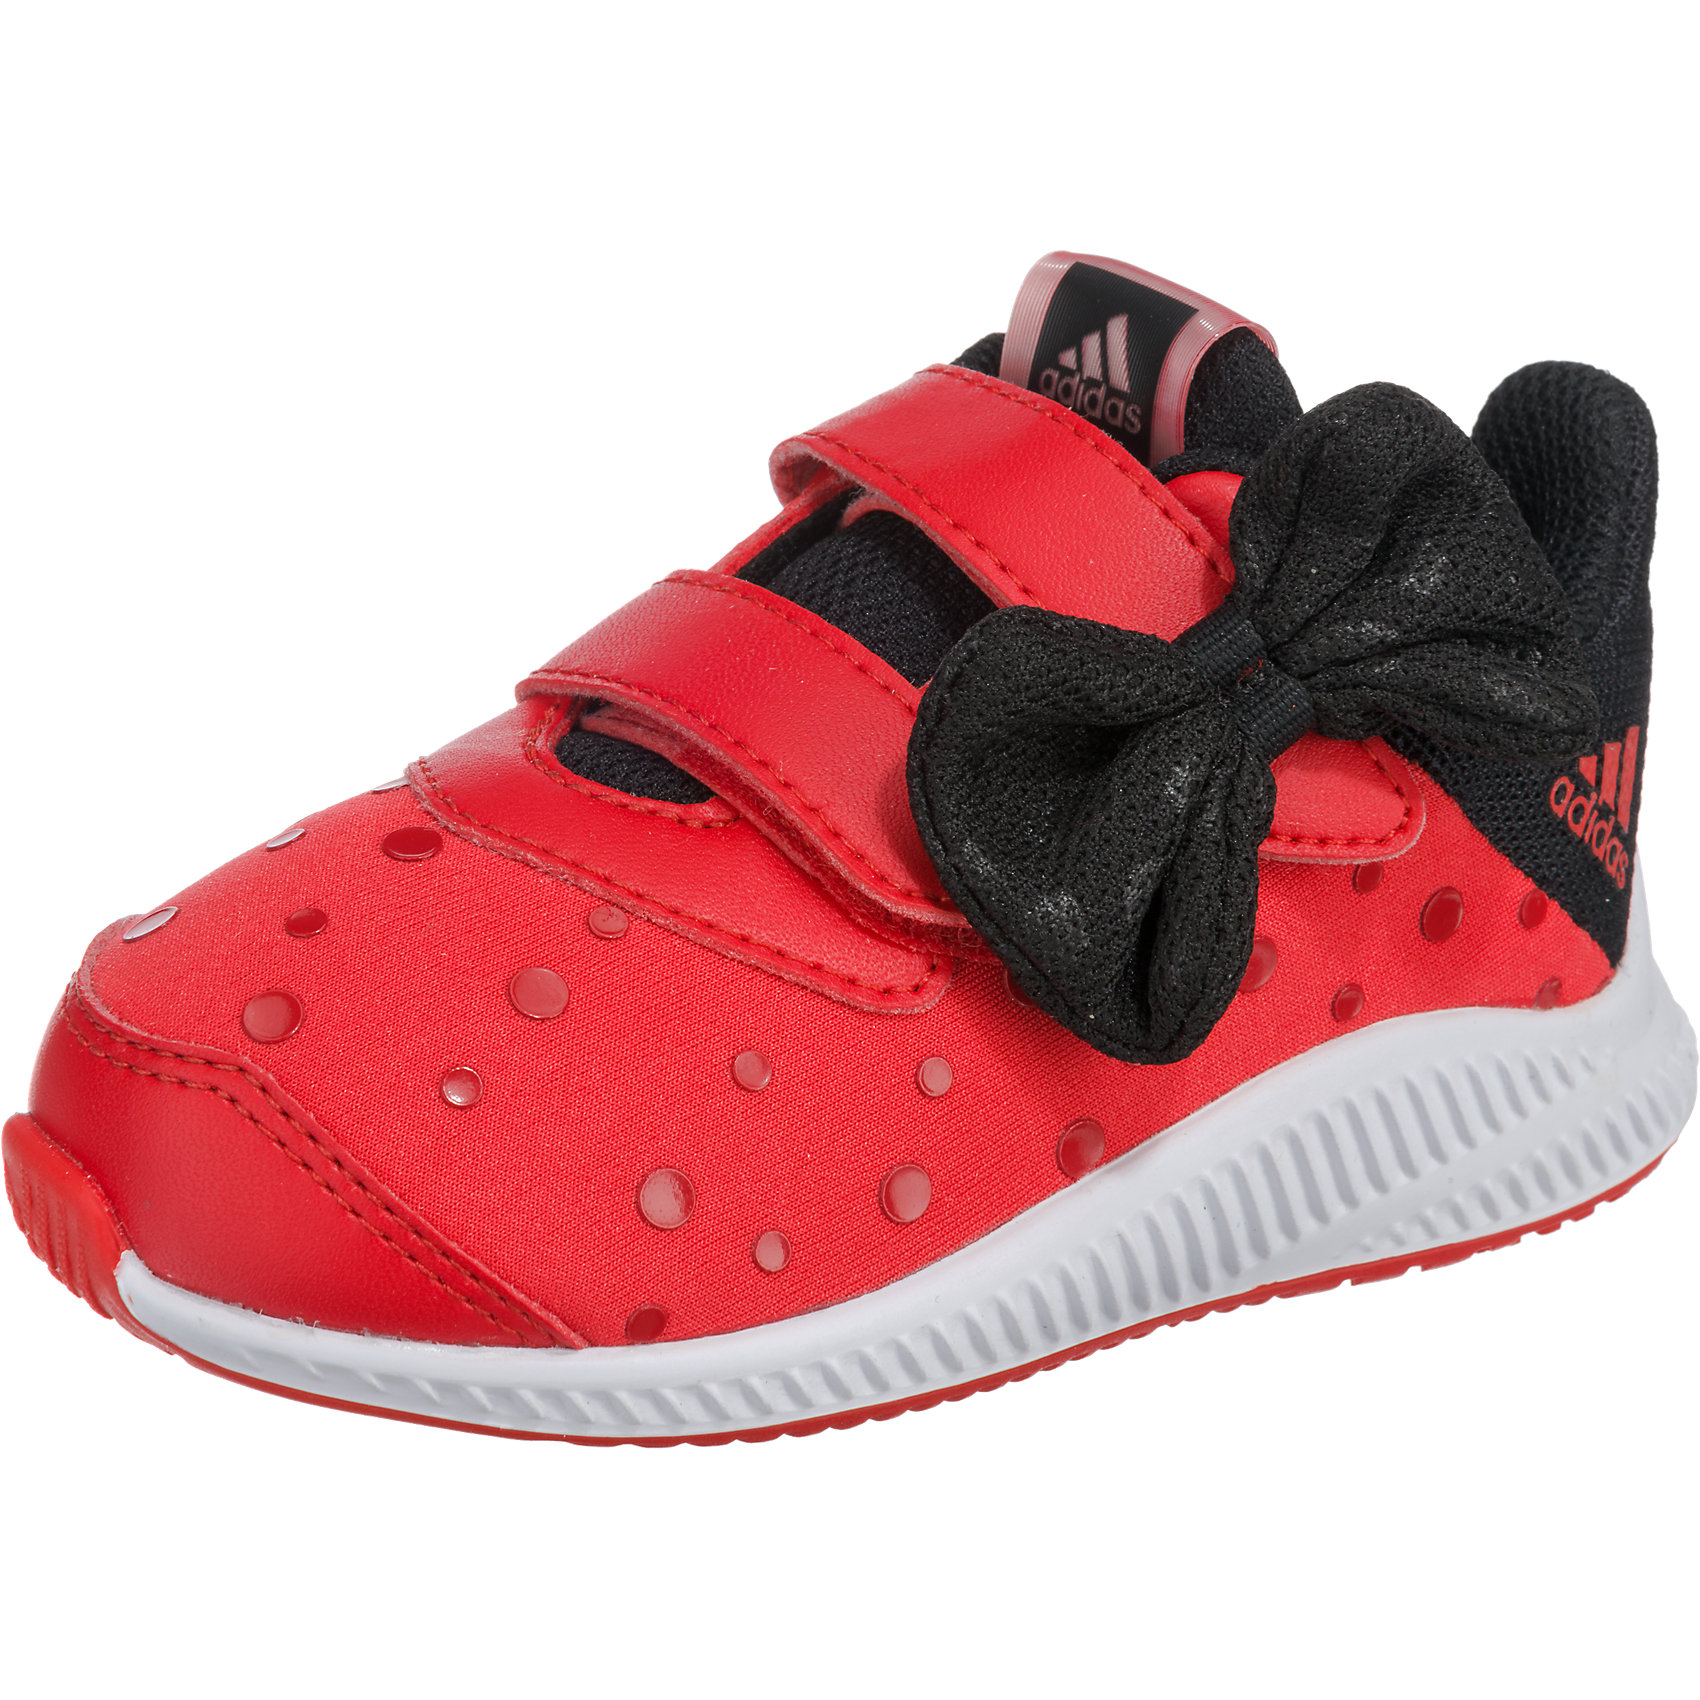 Neu-adidas-Performance-Baby-Sportschuhe-Disney-Minnie-FortaRun-